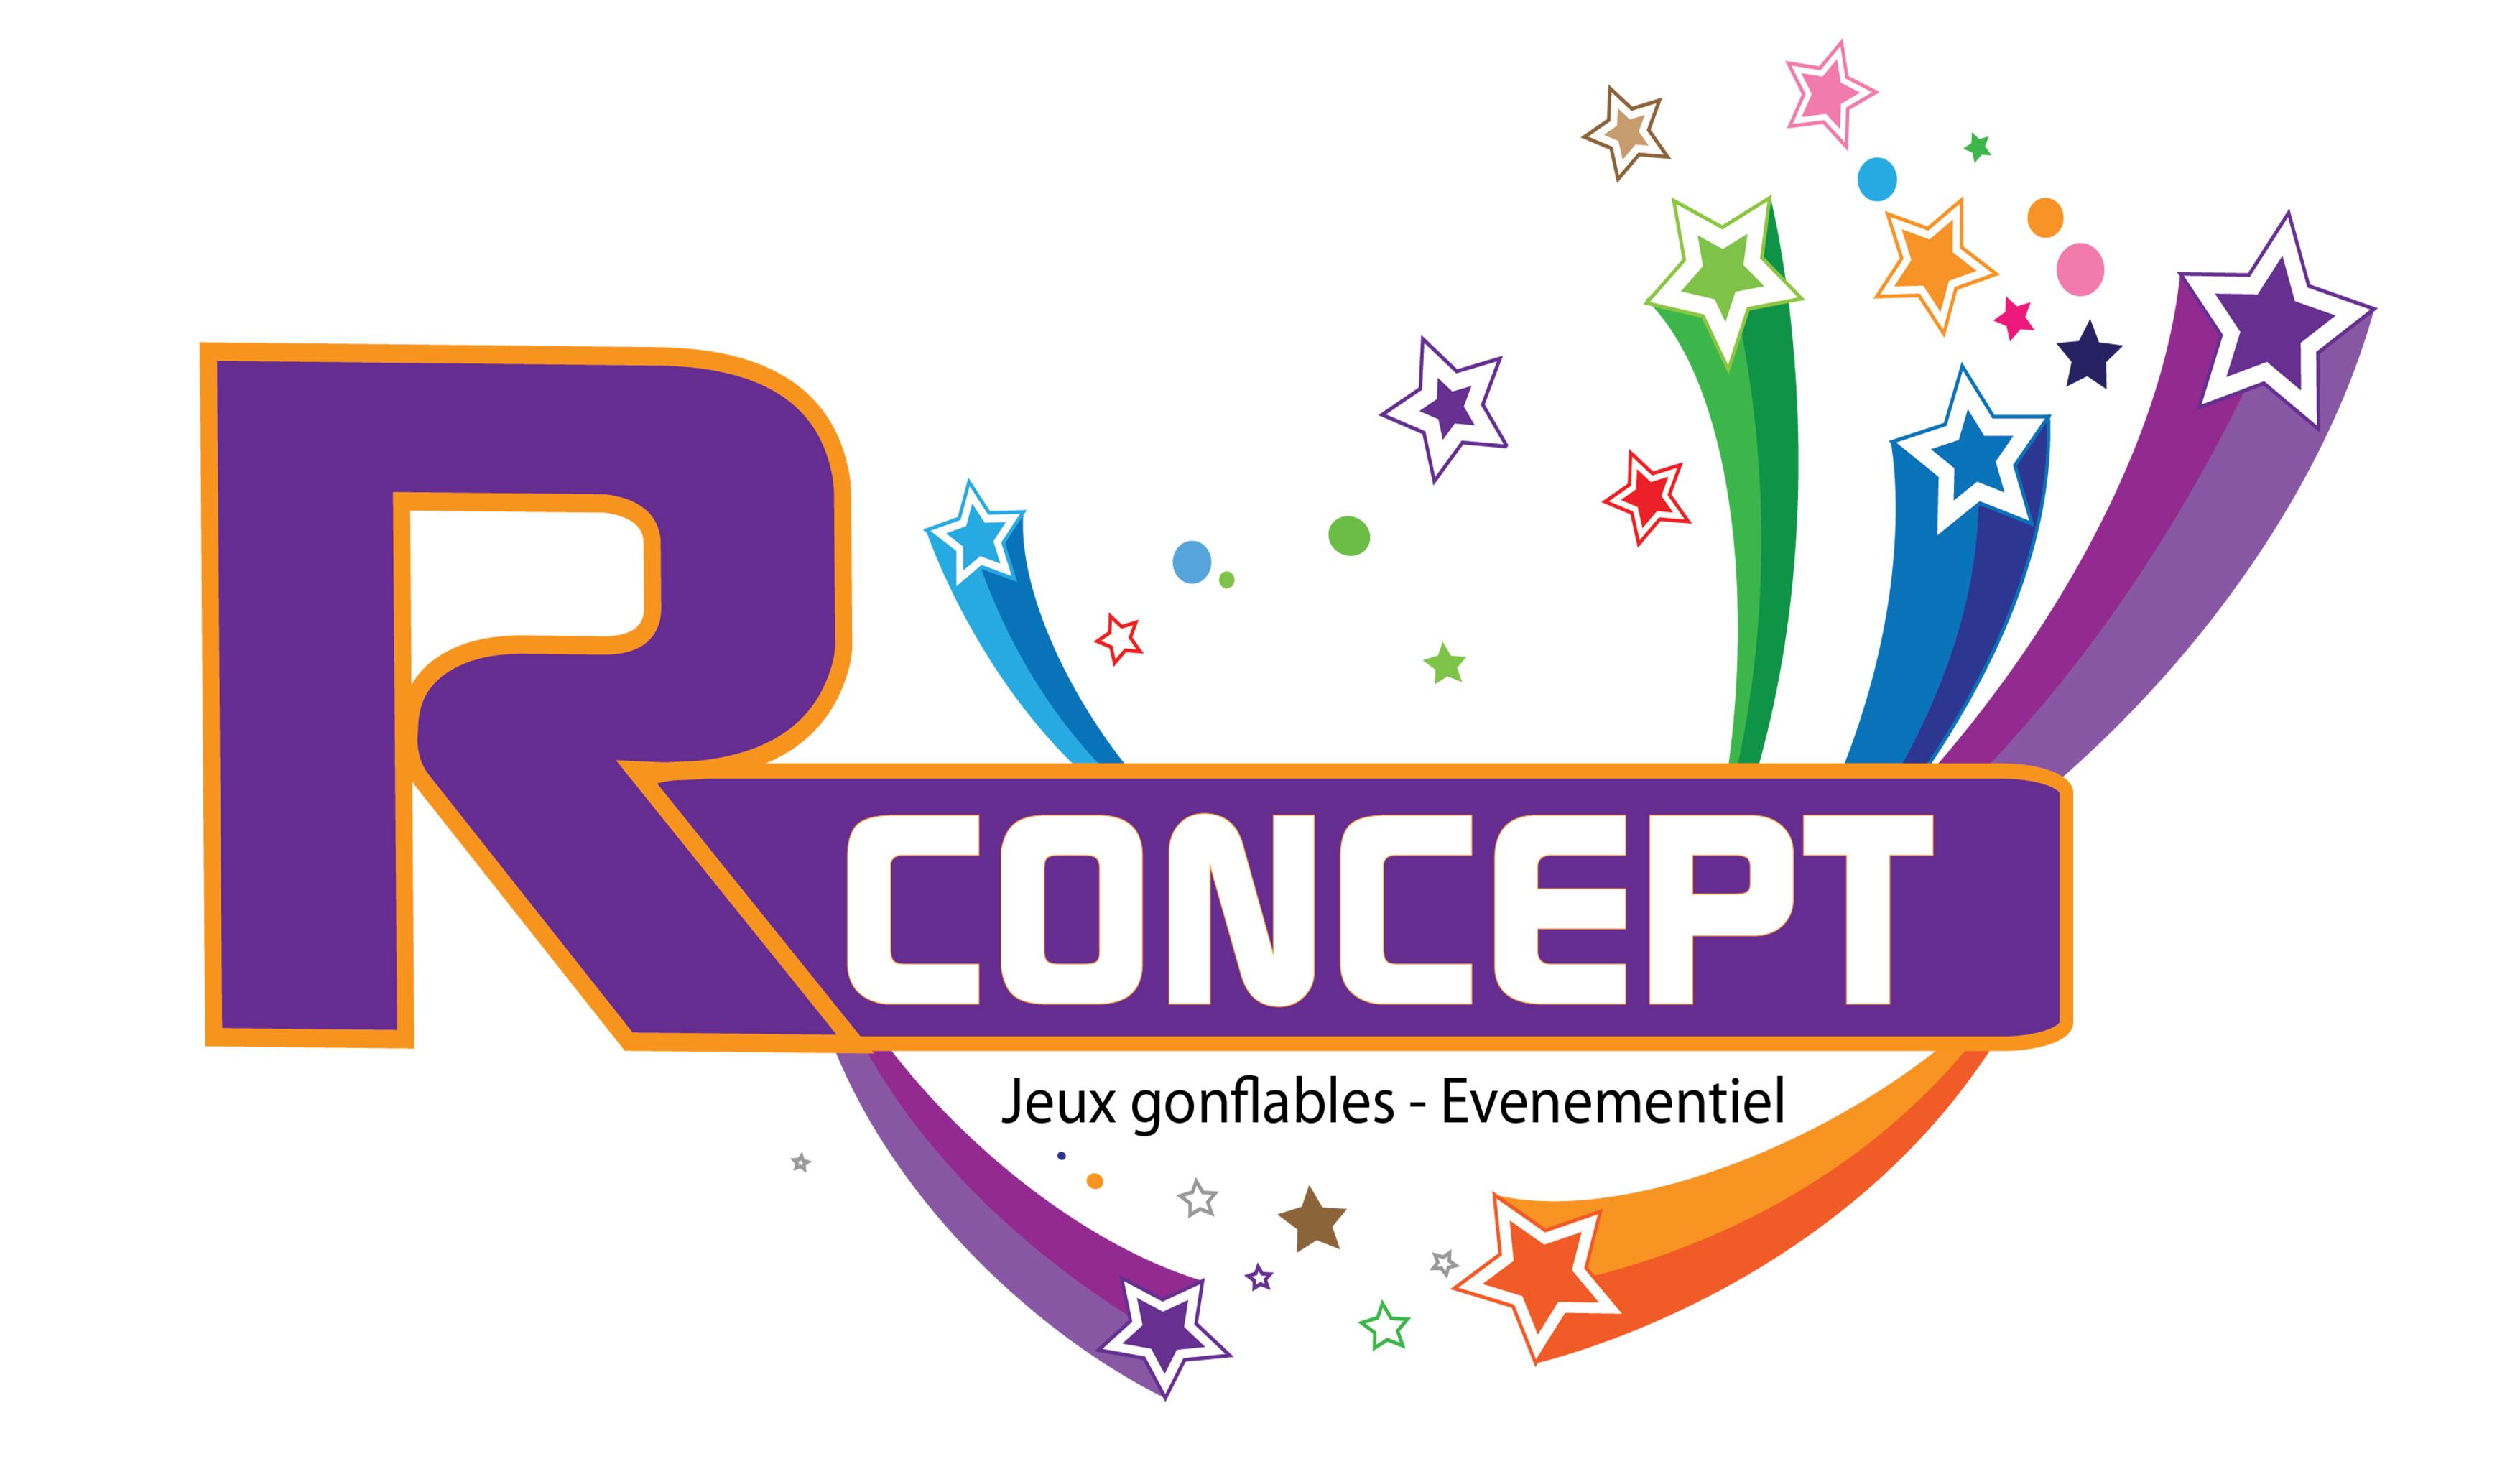 R'concept